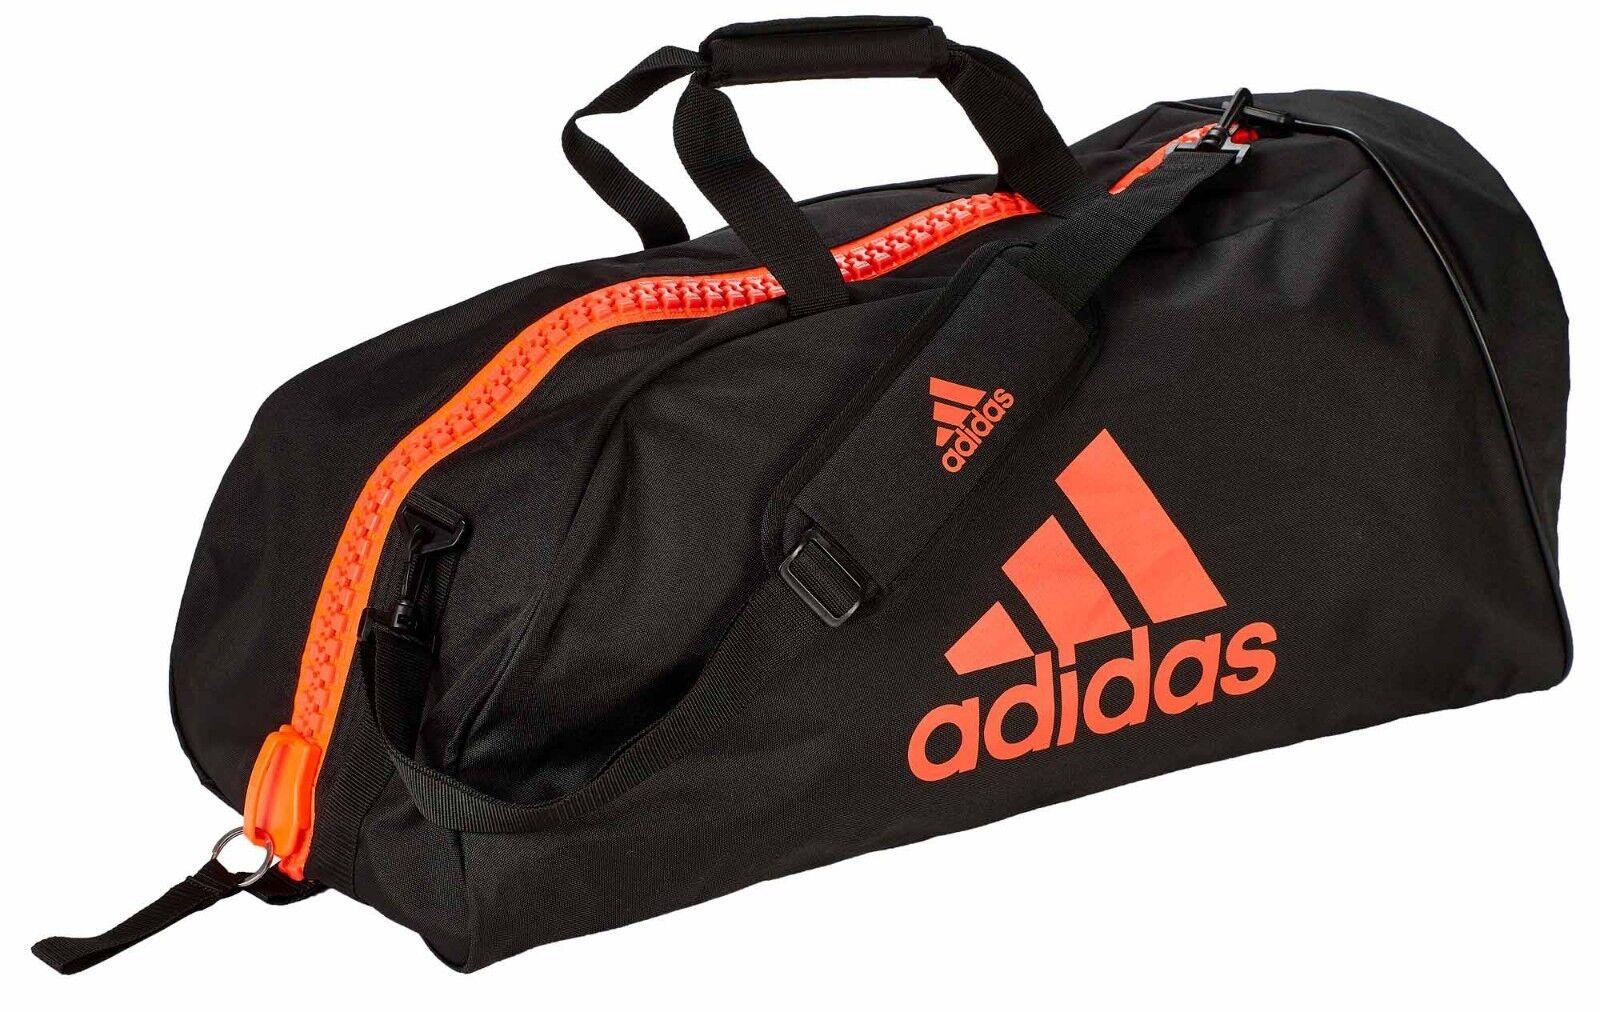 Adidas bolsa de gimnasia  Martial Arts  negro rojo nylon, adiacc 055-Sport-bolsa